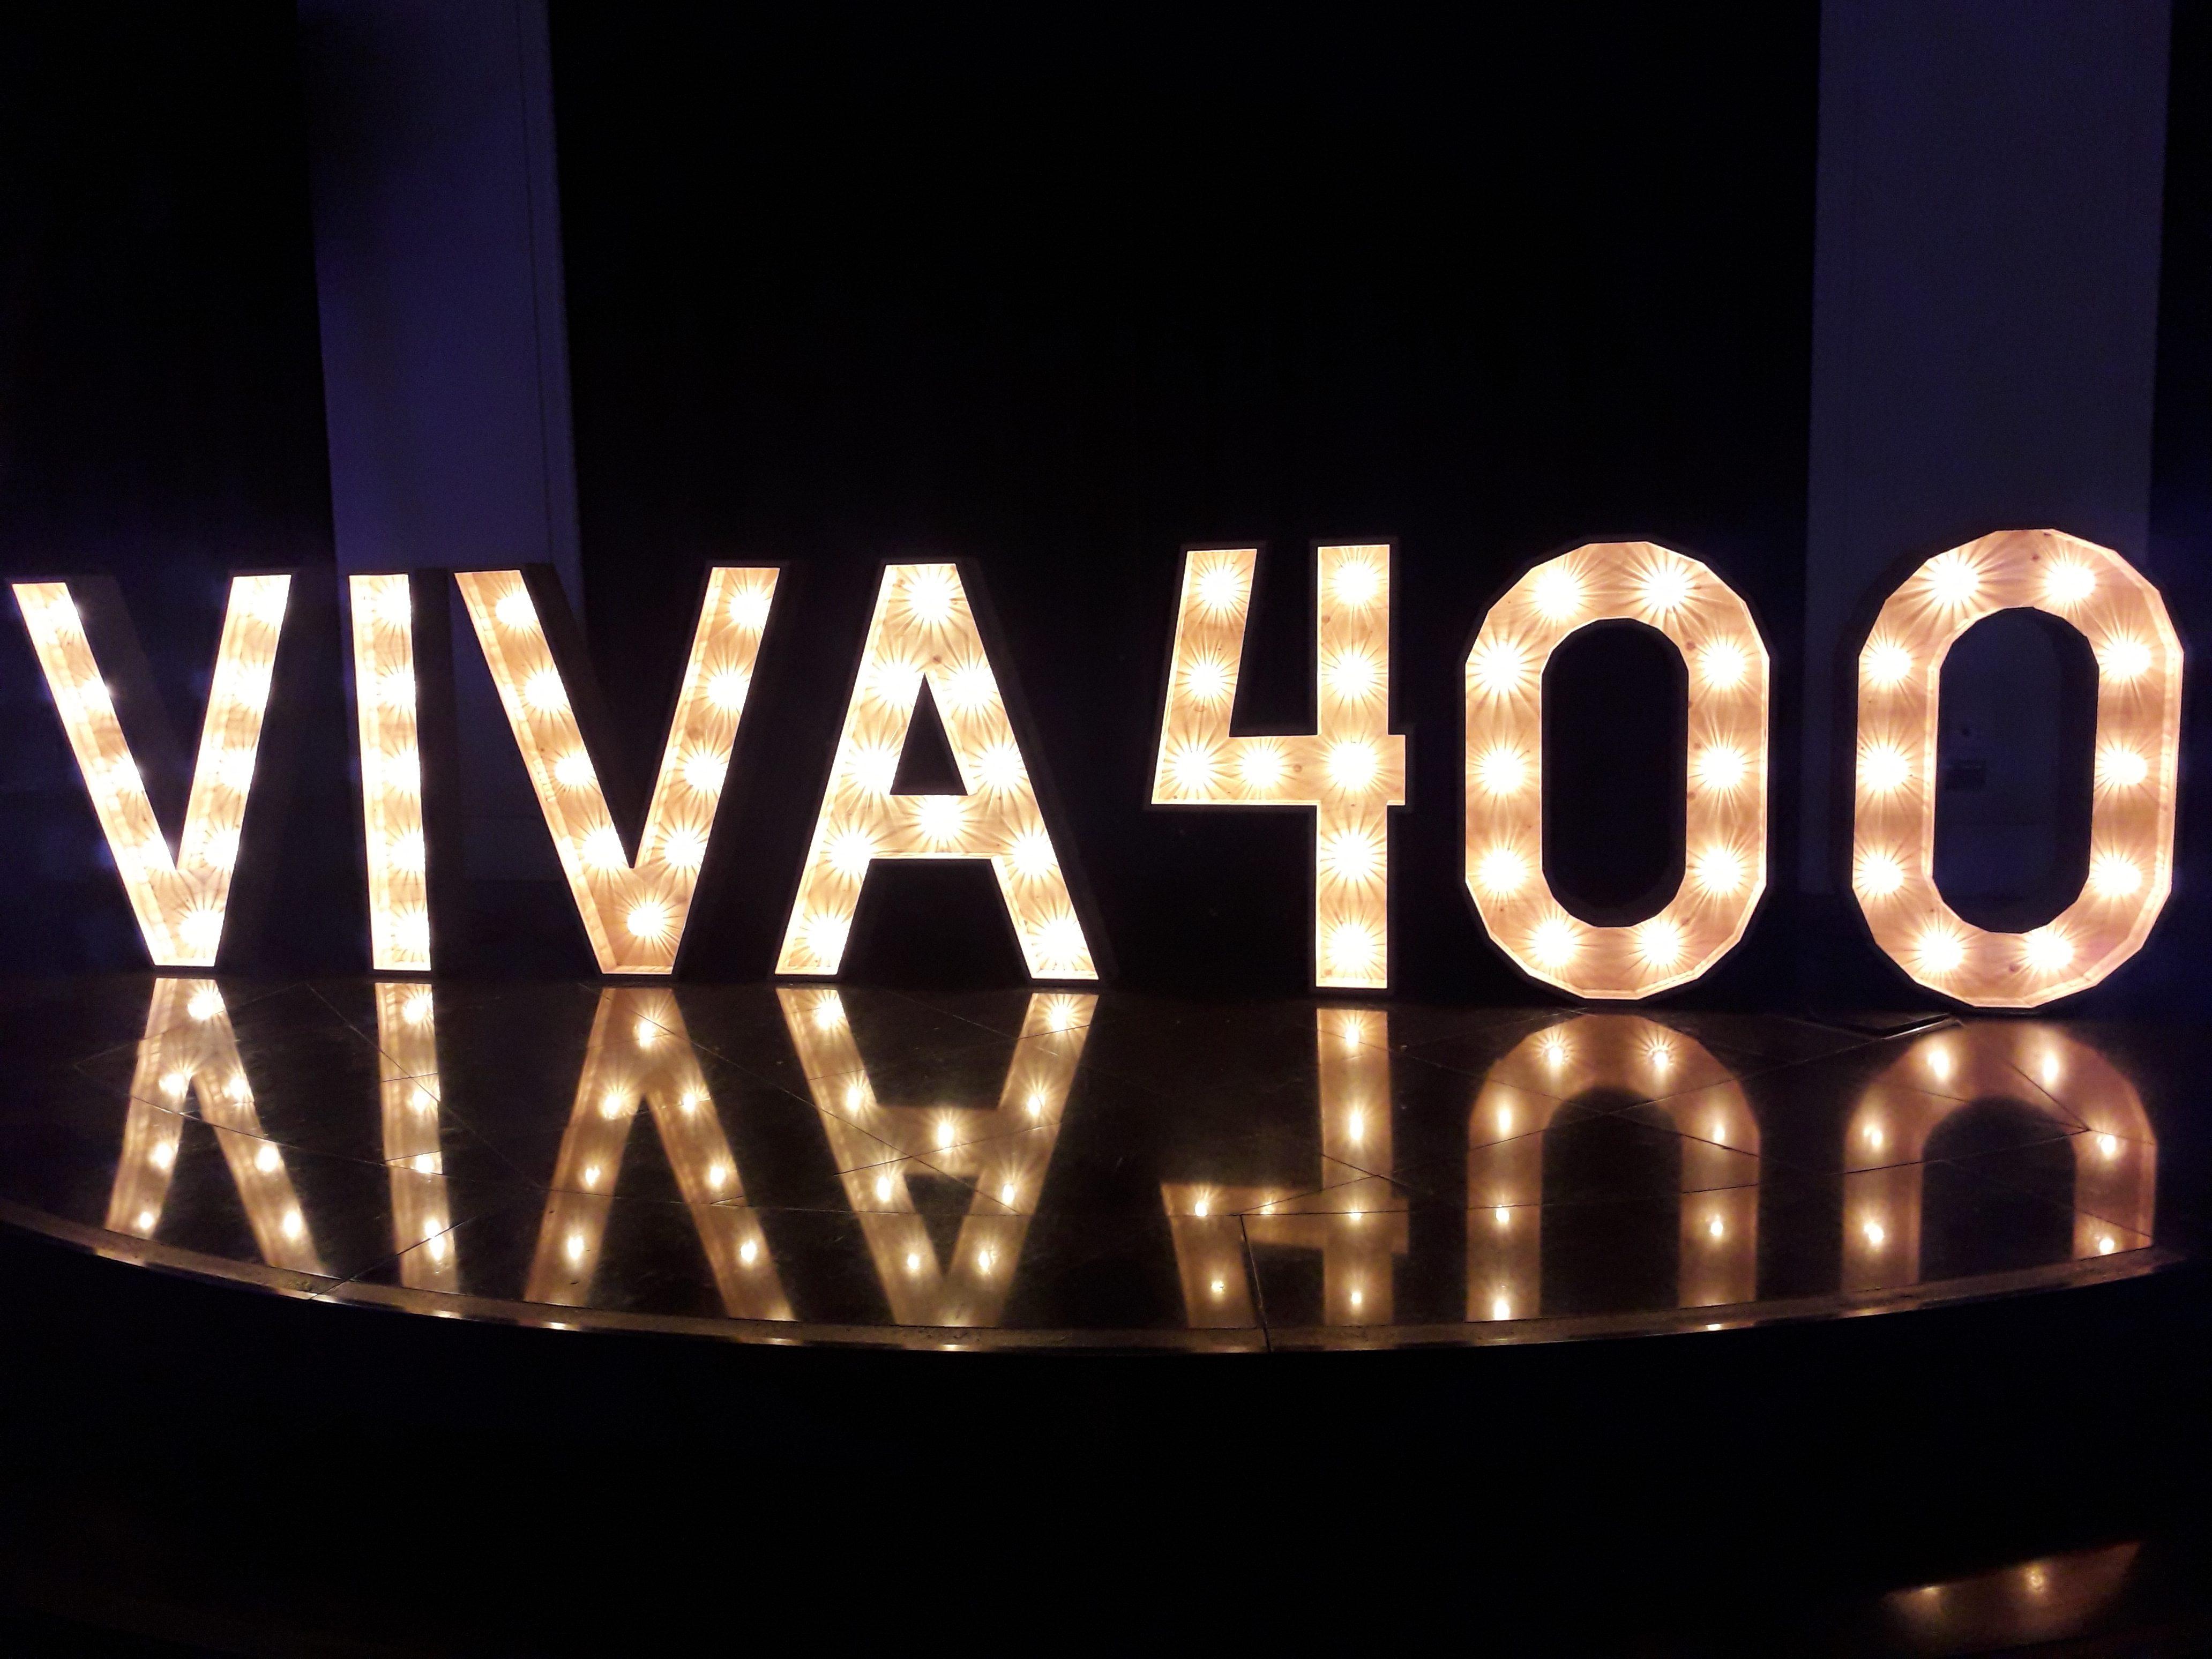 Viva400 Awards 2018